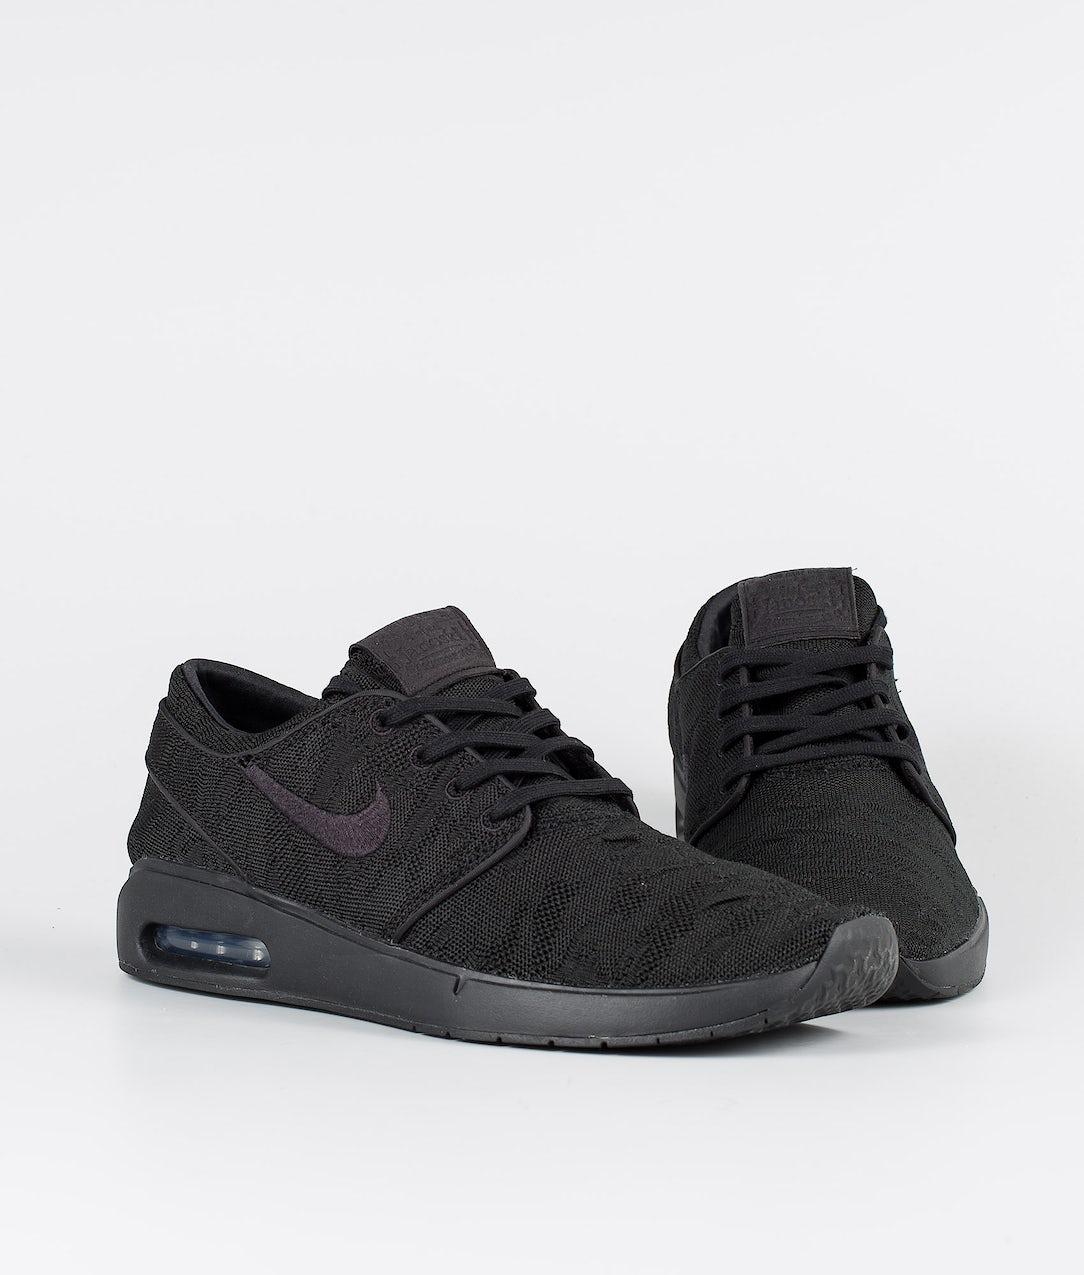 Ocurrir práctica Parlamento  Nike SB Air Max Janoski 2 Shoes Black/Black-Black-Black - Ridestore.com